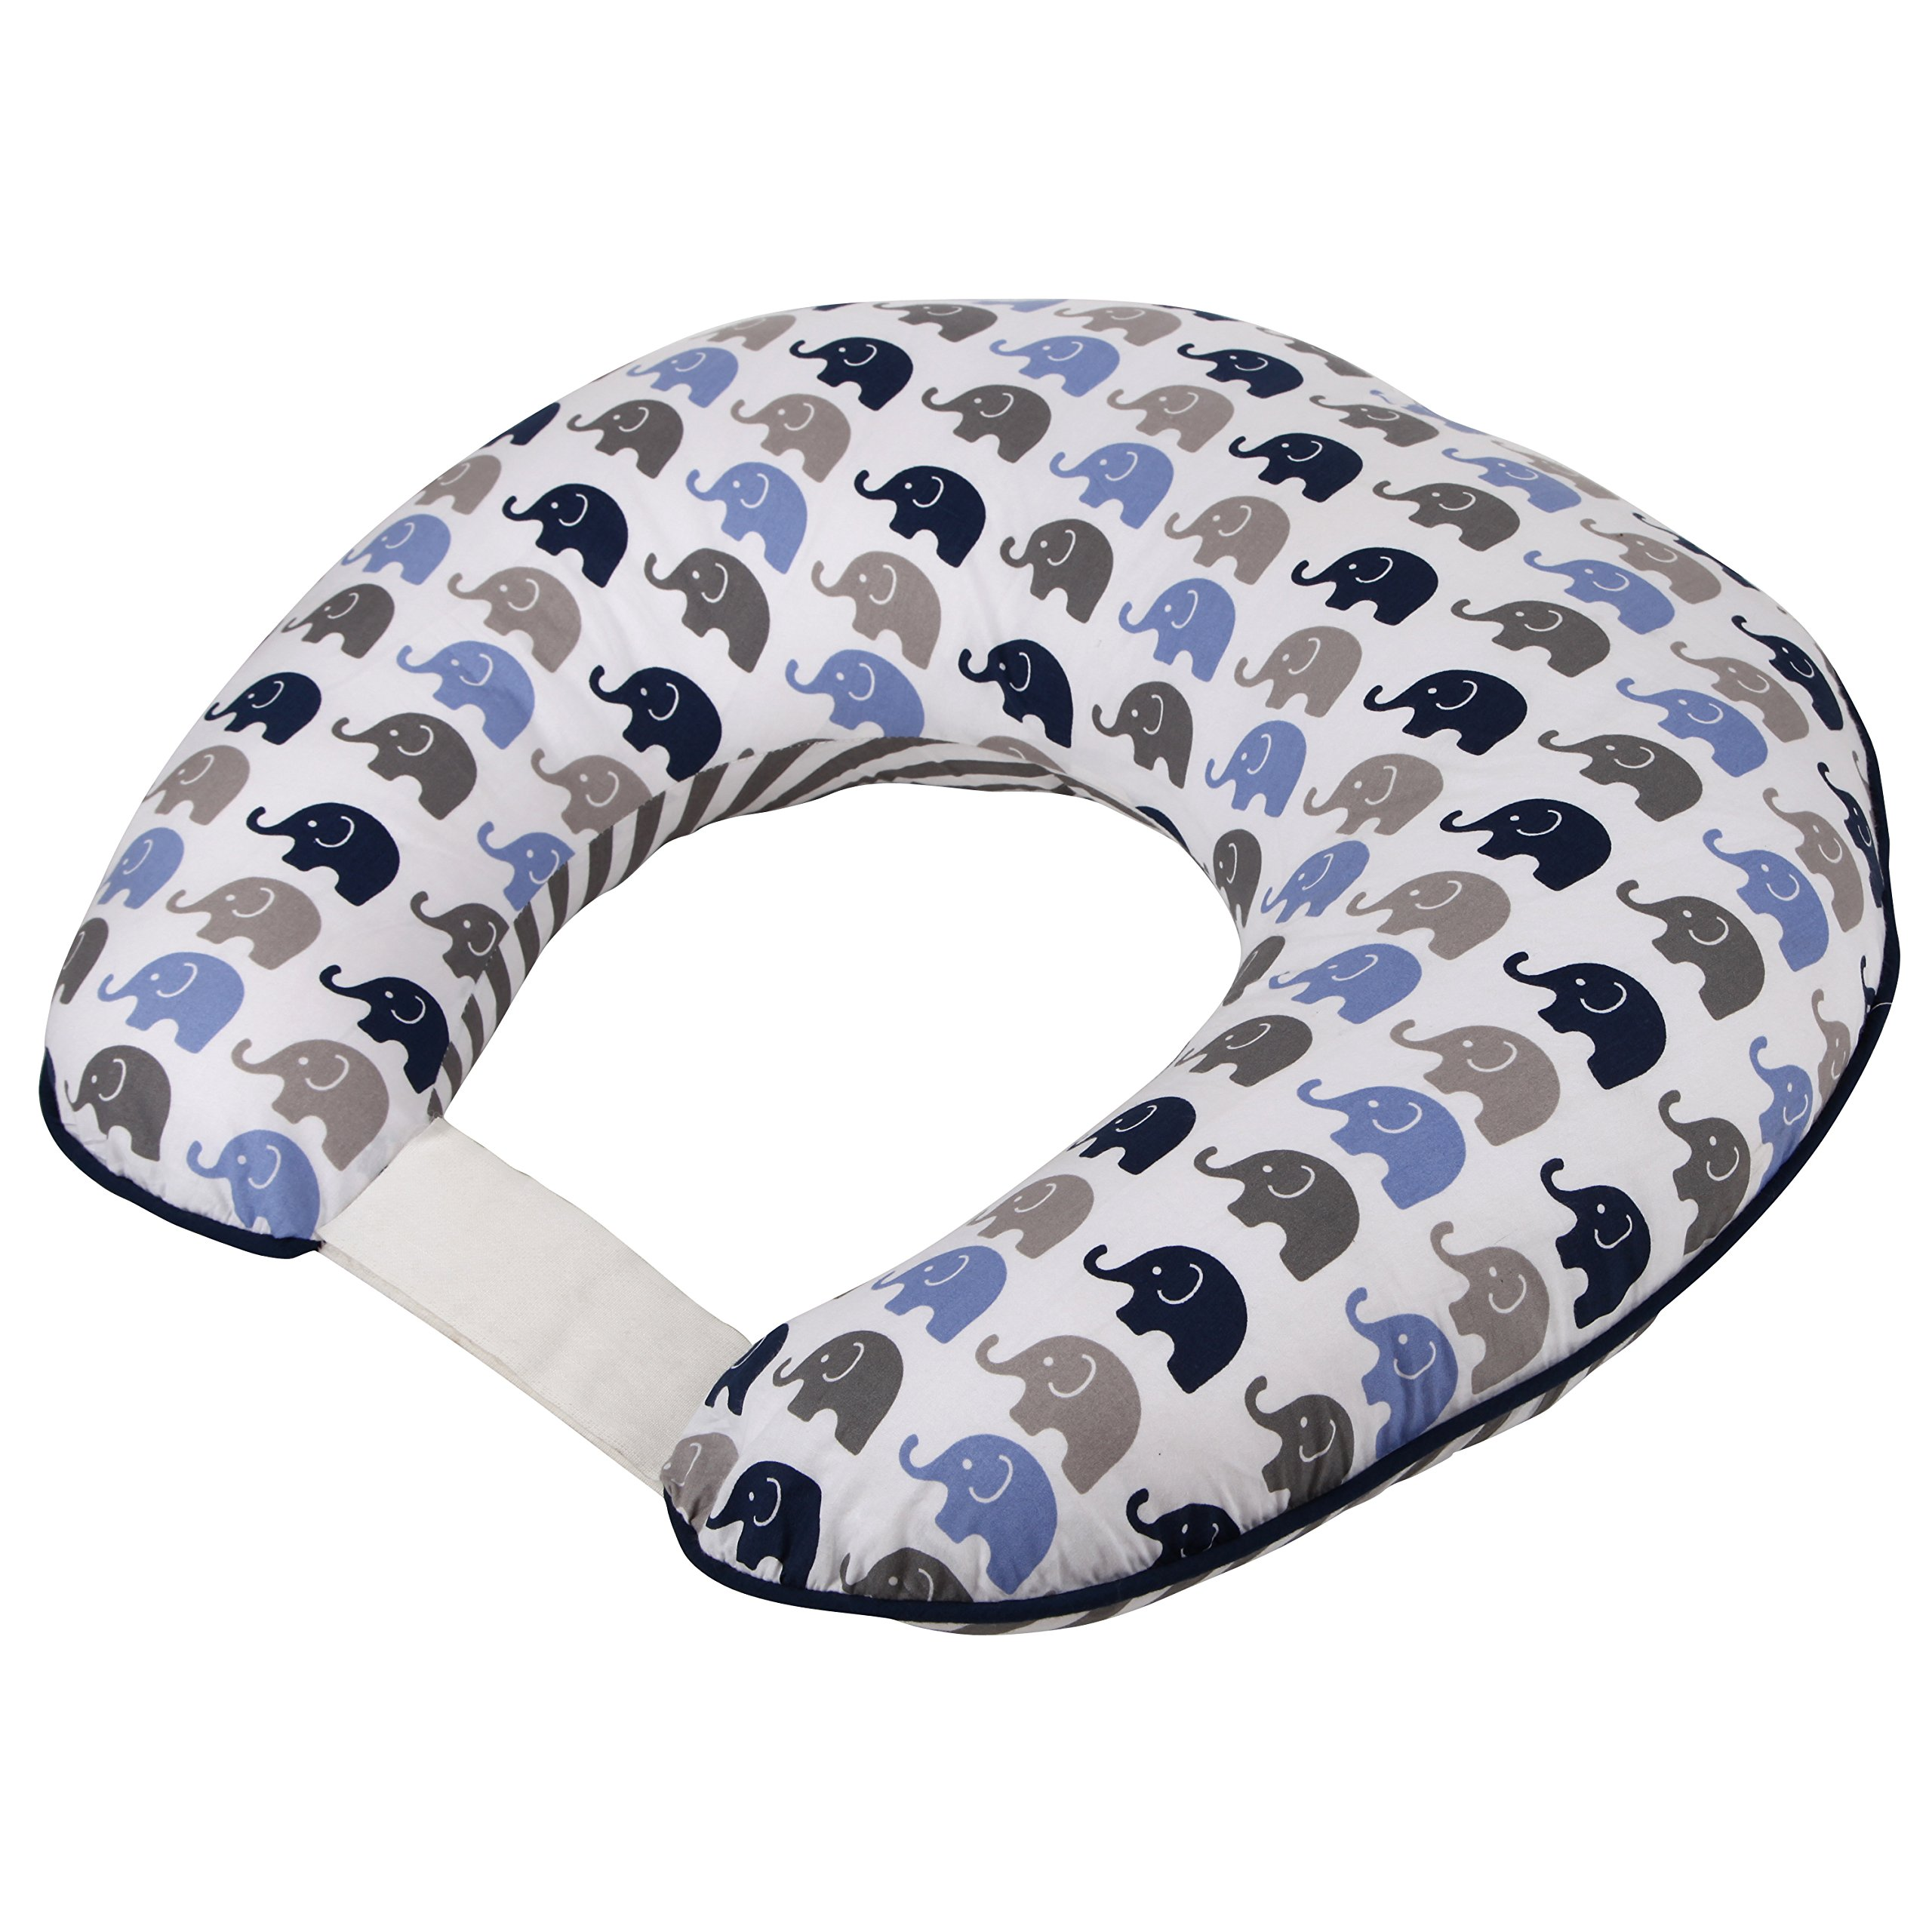 Bacati - Elephants Blue/grey Nursing Pillow Cover by Bacati